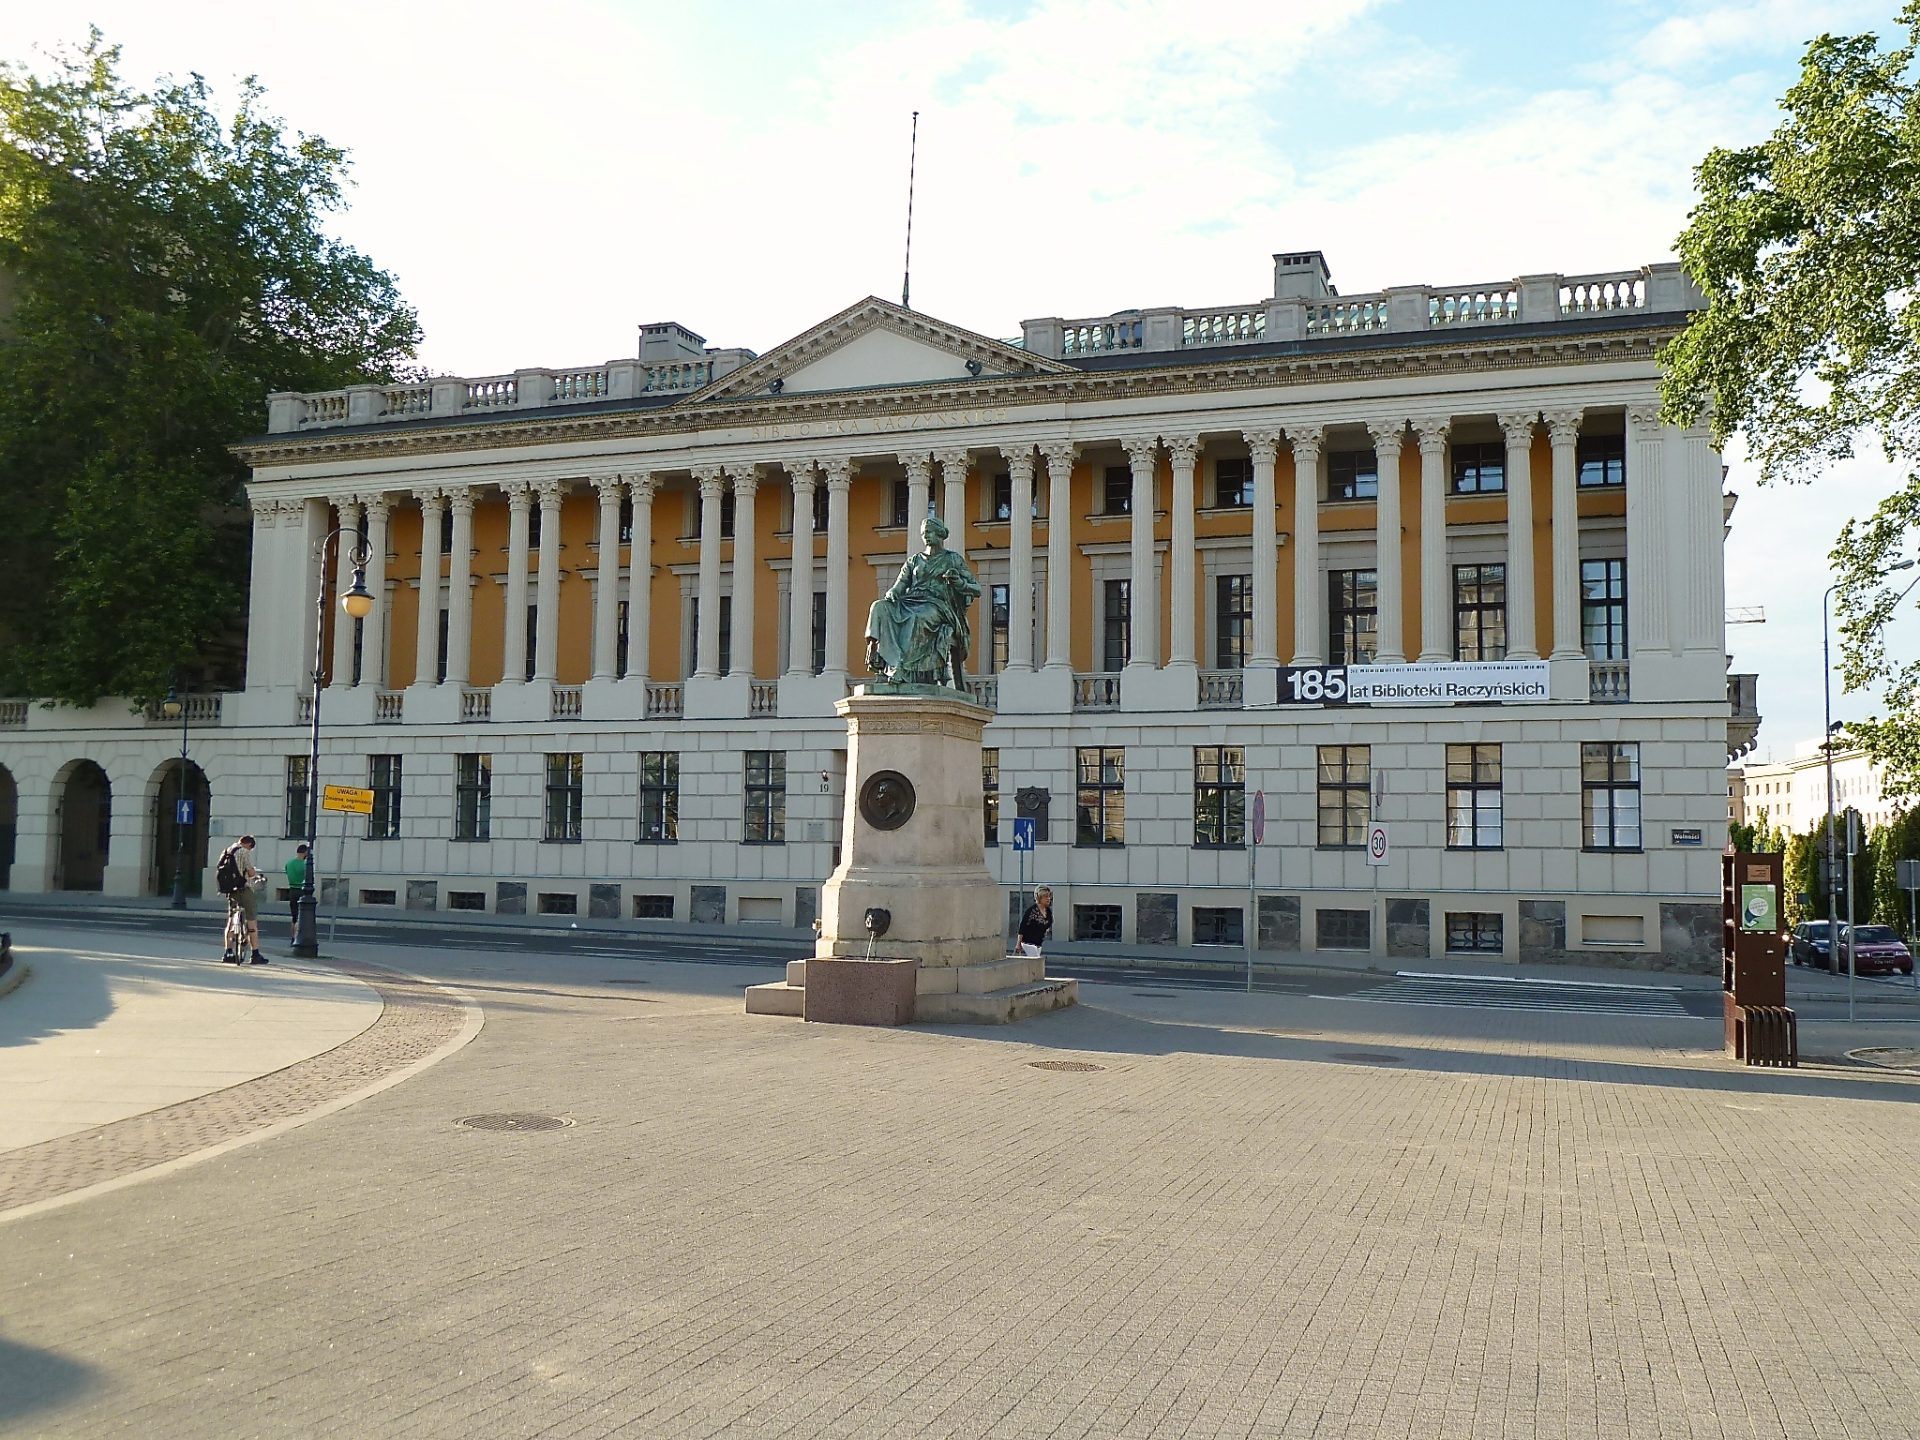 Posen – Poznan